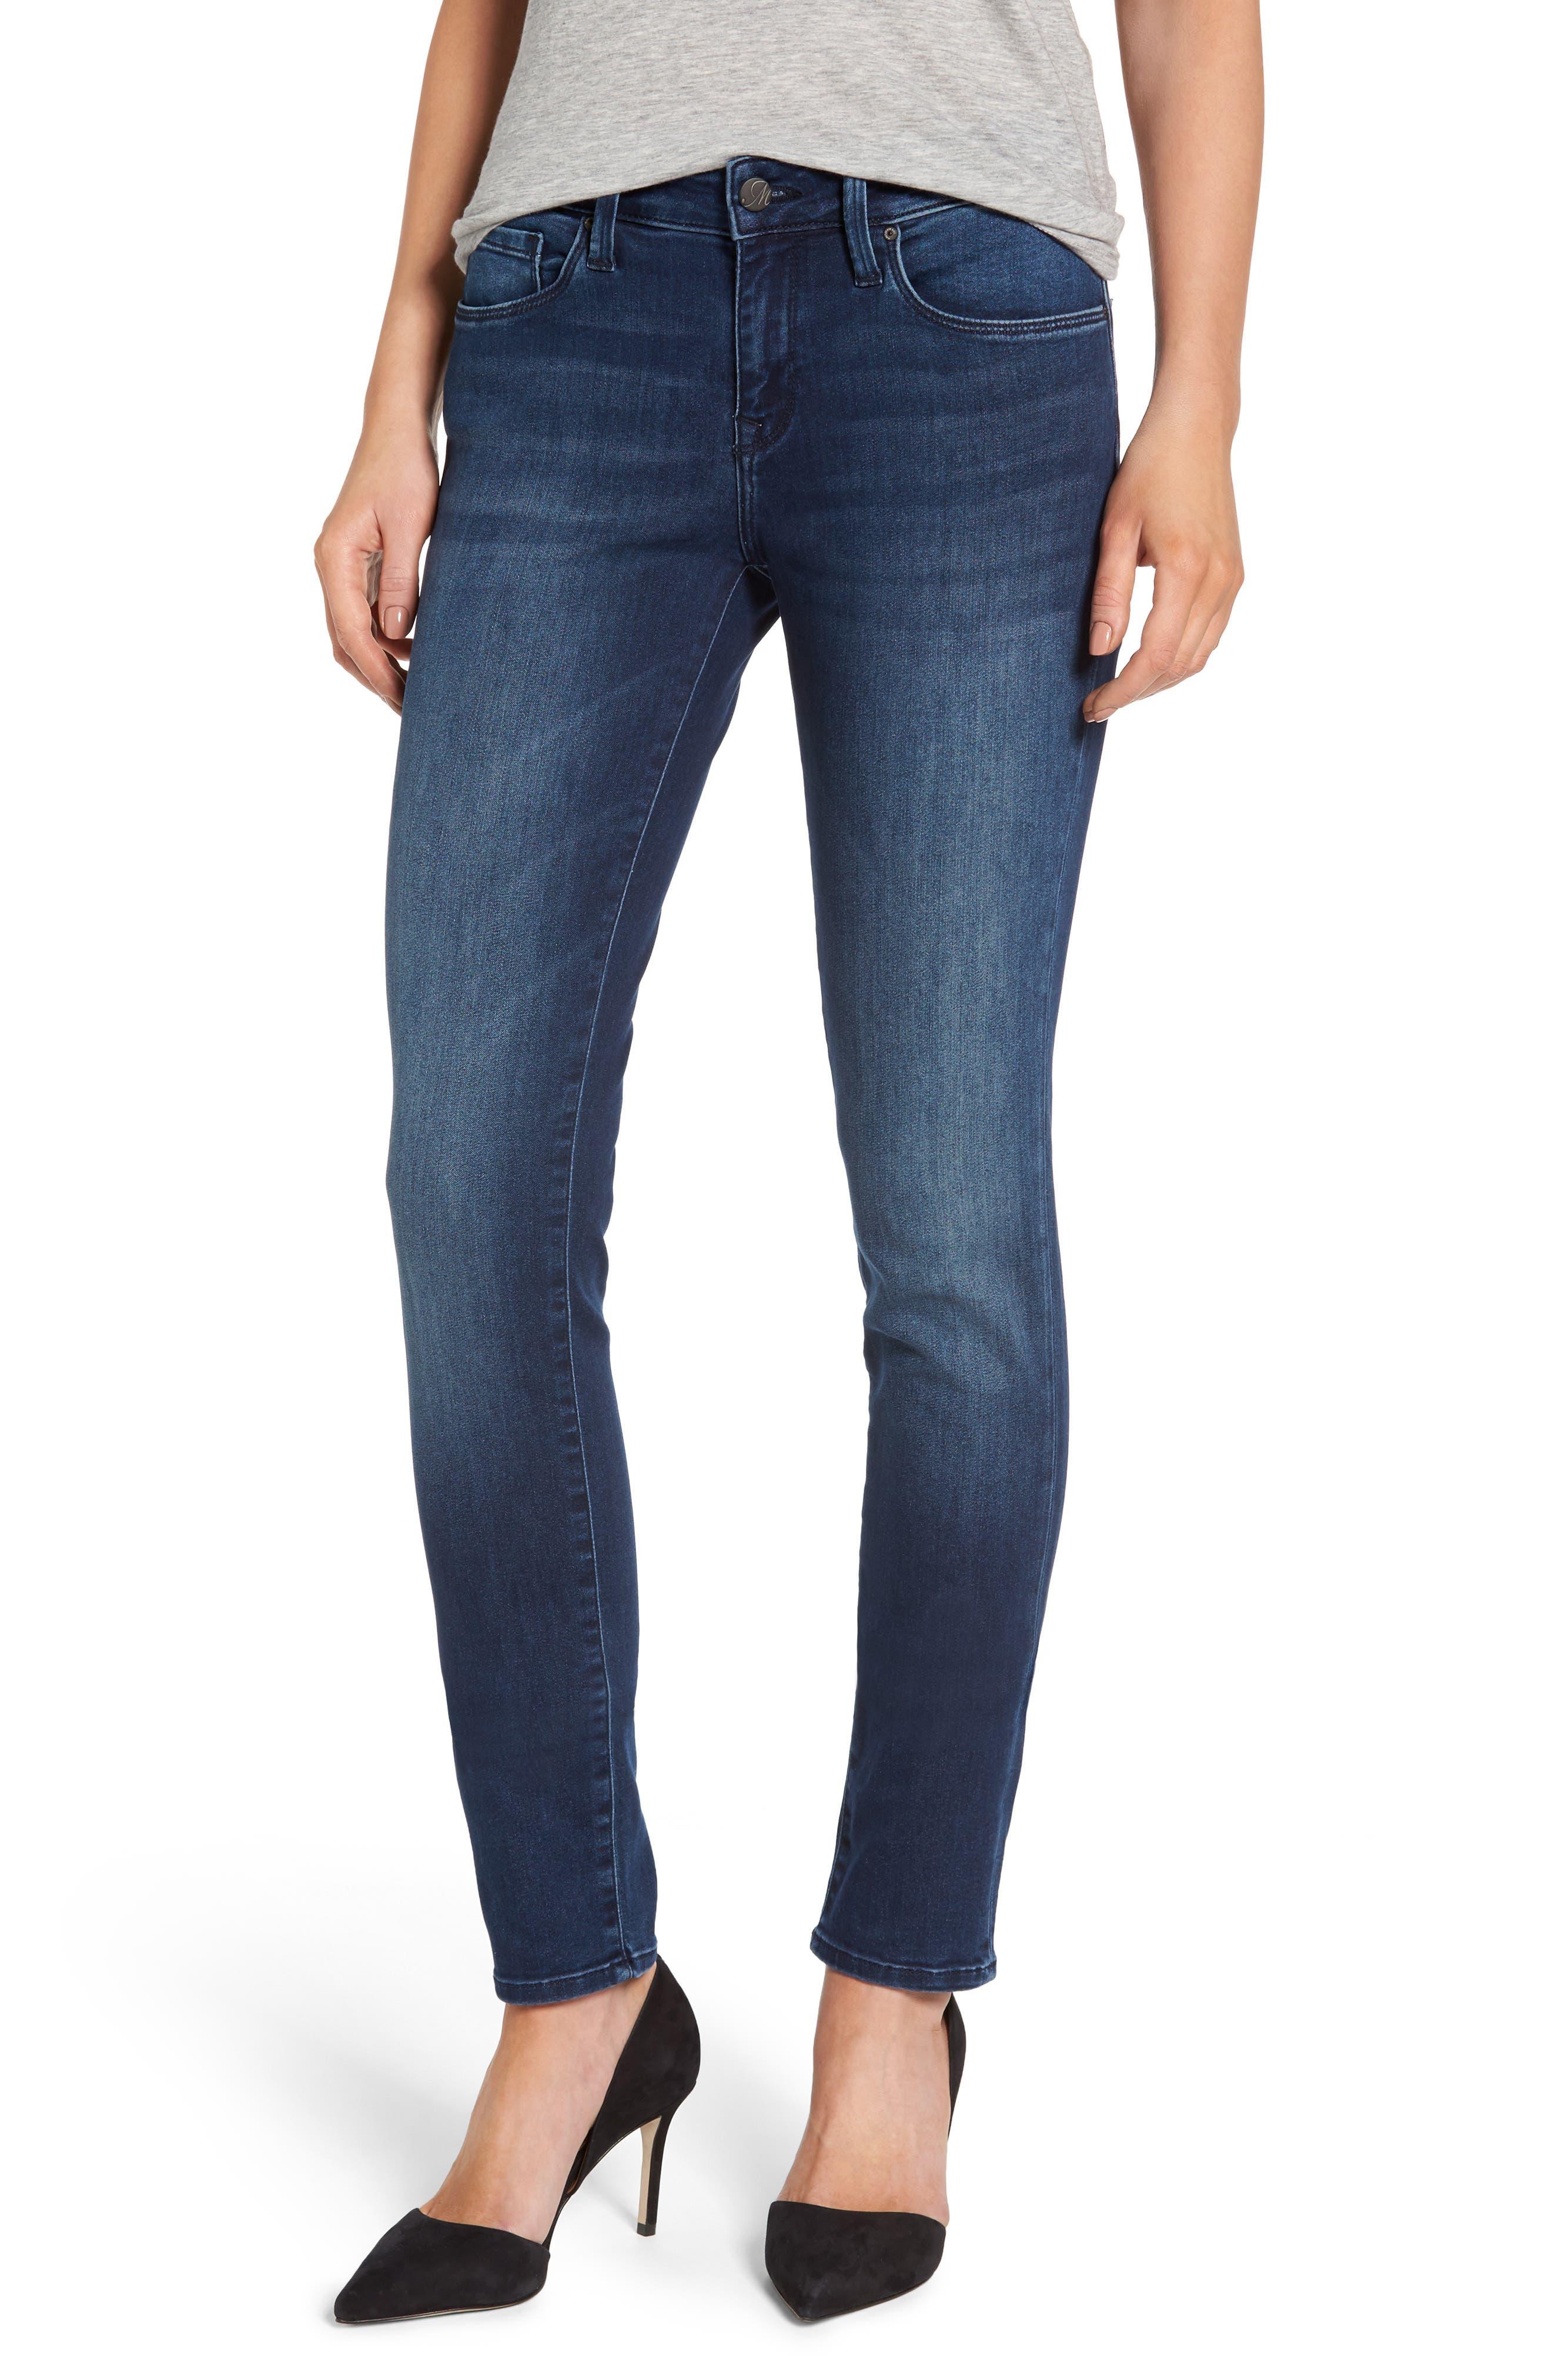 Mavi Jeans Alexa Skinny Jeans (Deep Shanti)